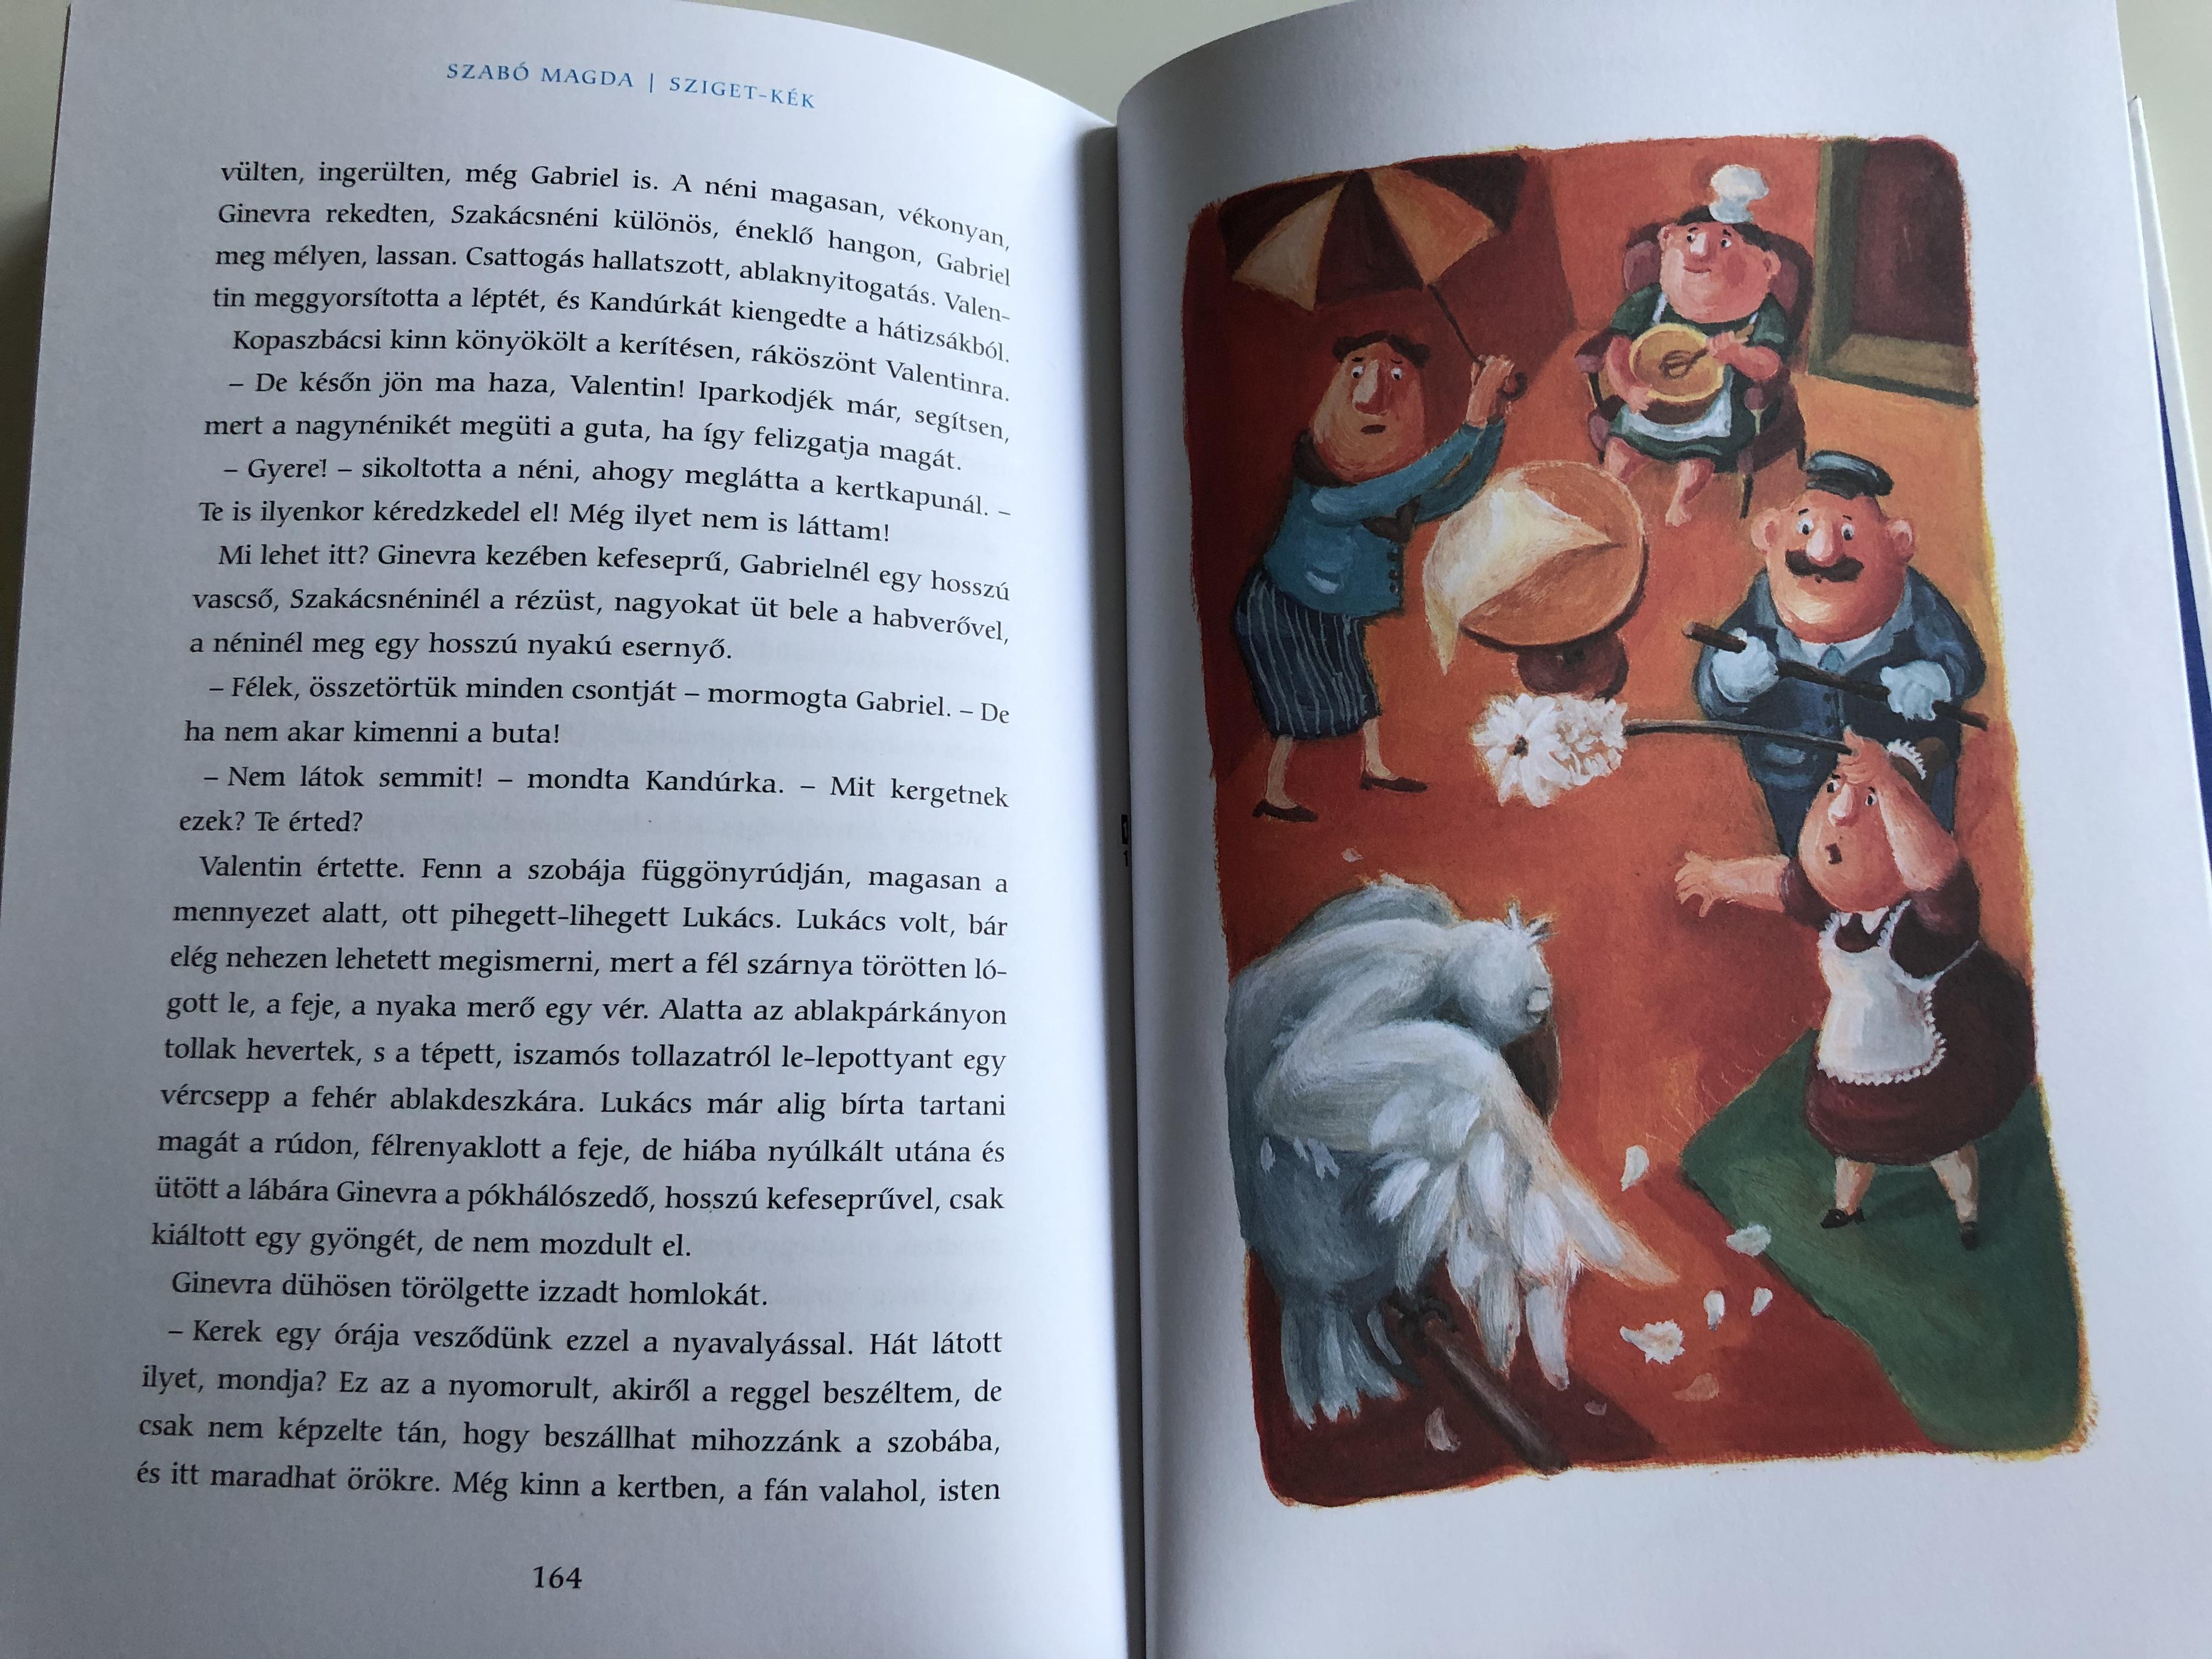 sziget-k-k-by-szab-magda-island-blue-hungarian-novel-for-children-szalma-edit-rajzaival-eur-pa-k-nyvkiad-2013-8-.jpg